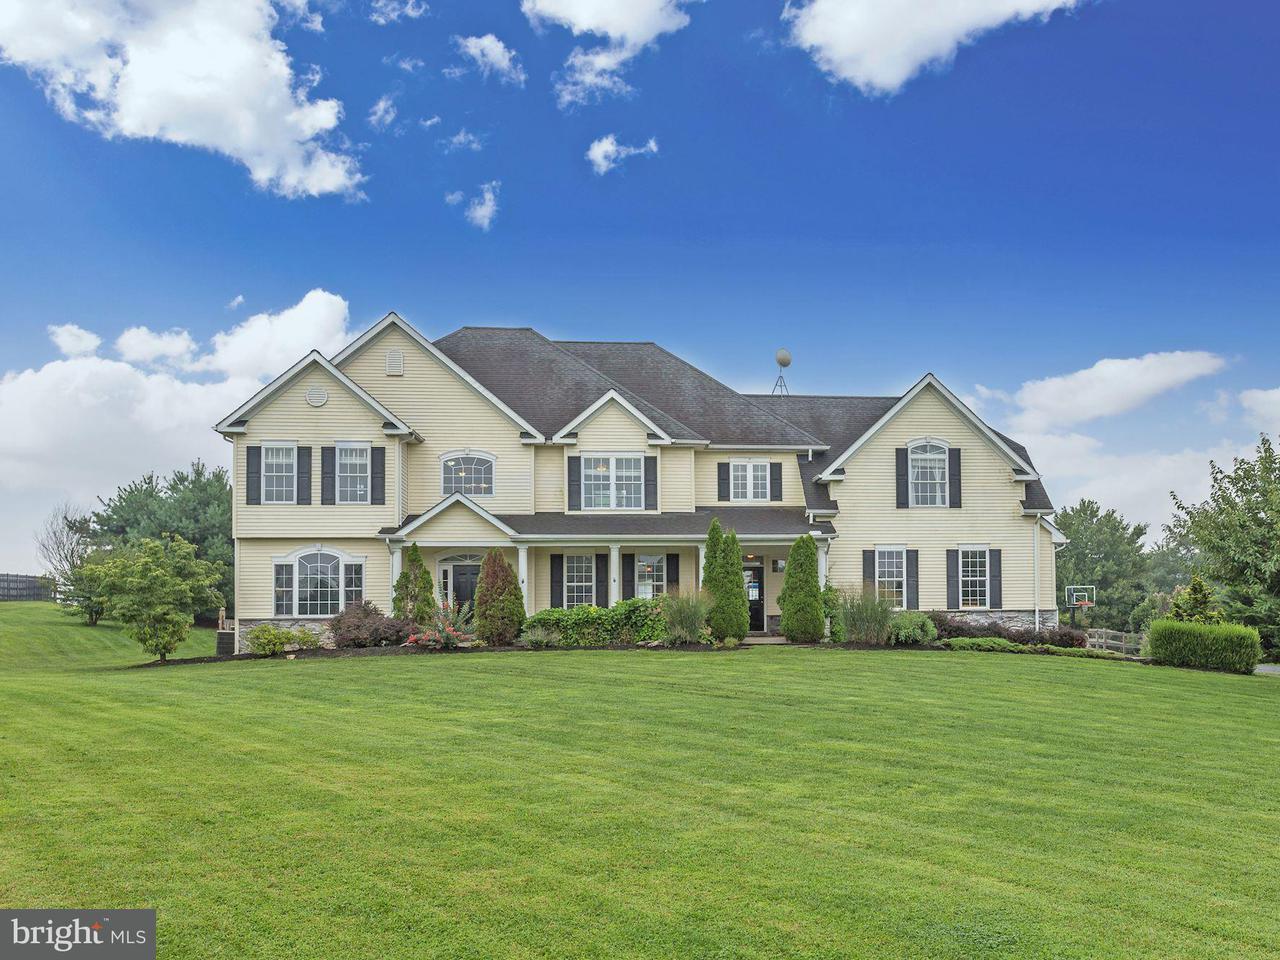 Casa Unifamiliar por un Venta en 6711 MILLIME Court 6711 MILLIME Court New Market, Maryland 21774 Estados Unidos